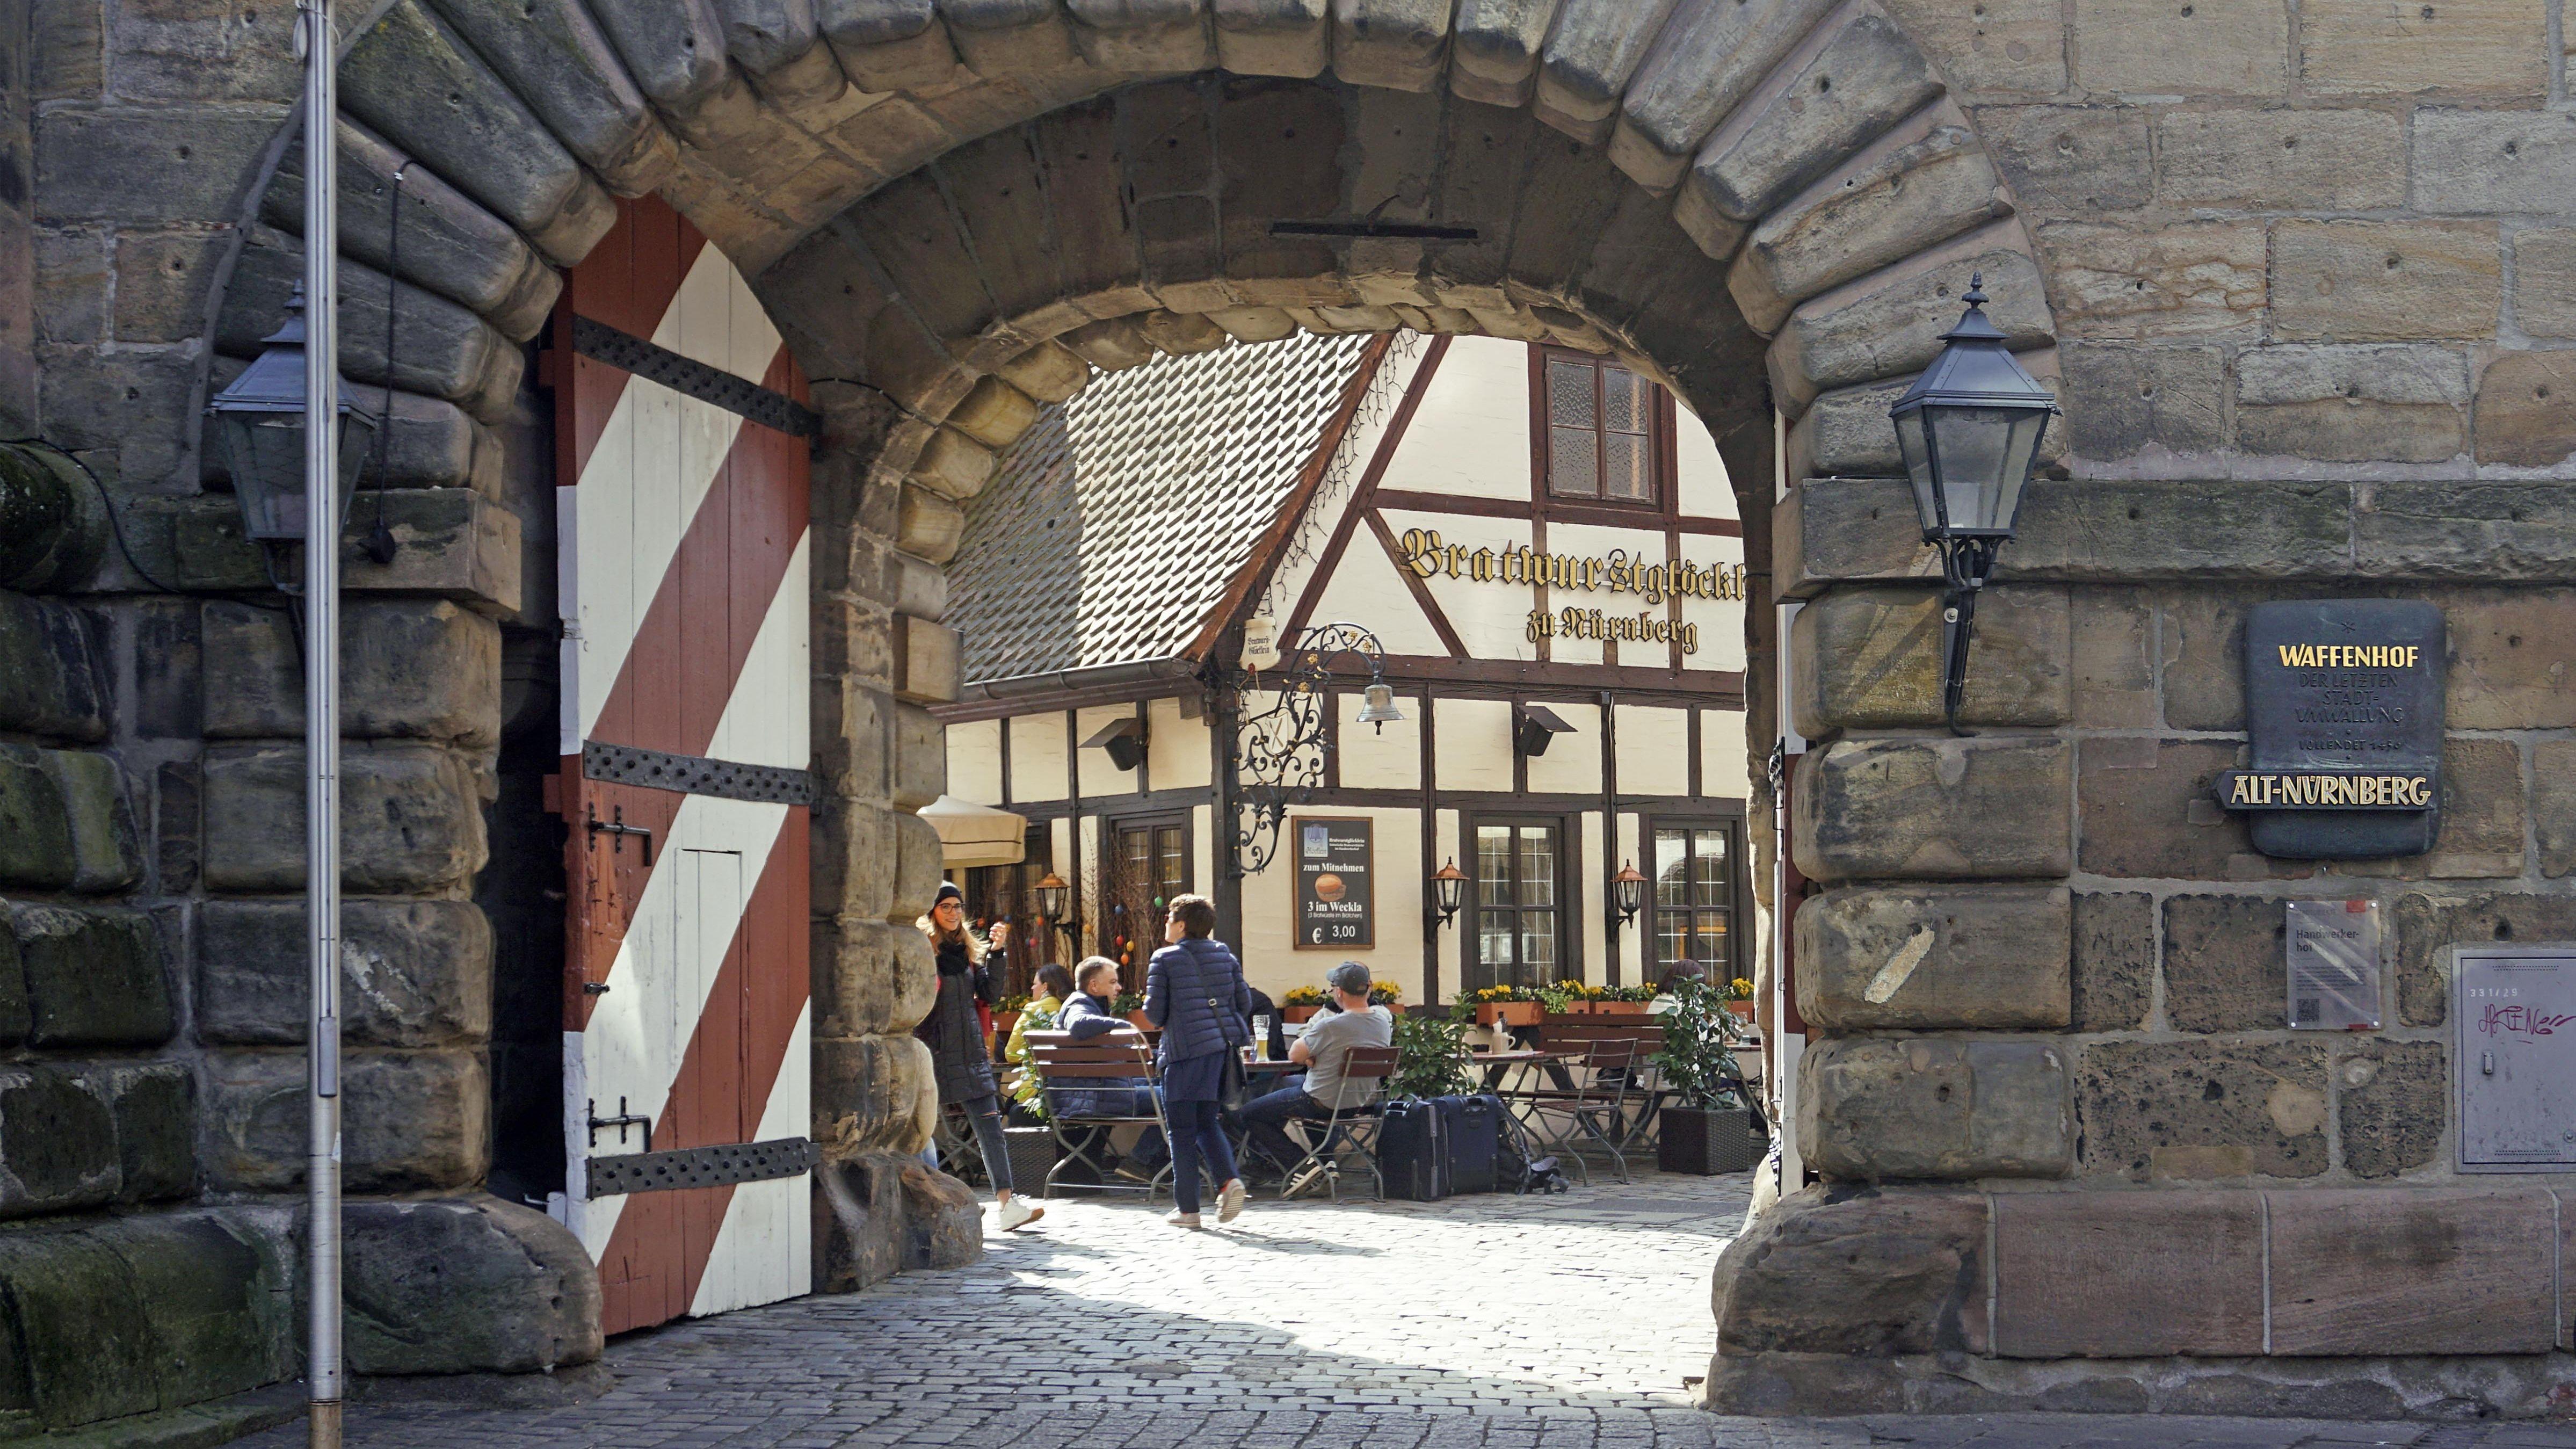 Nürnberger Handwerkerhof